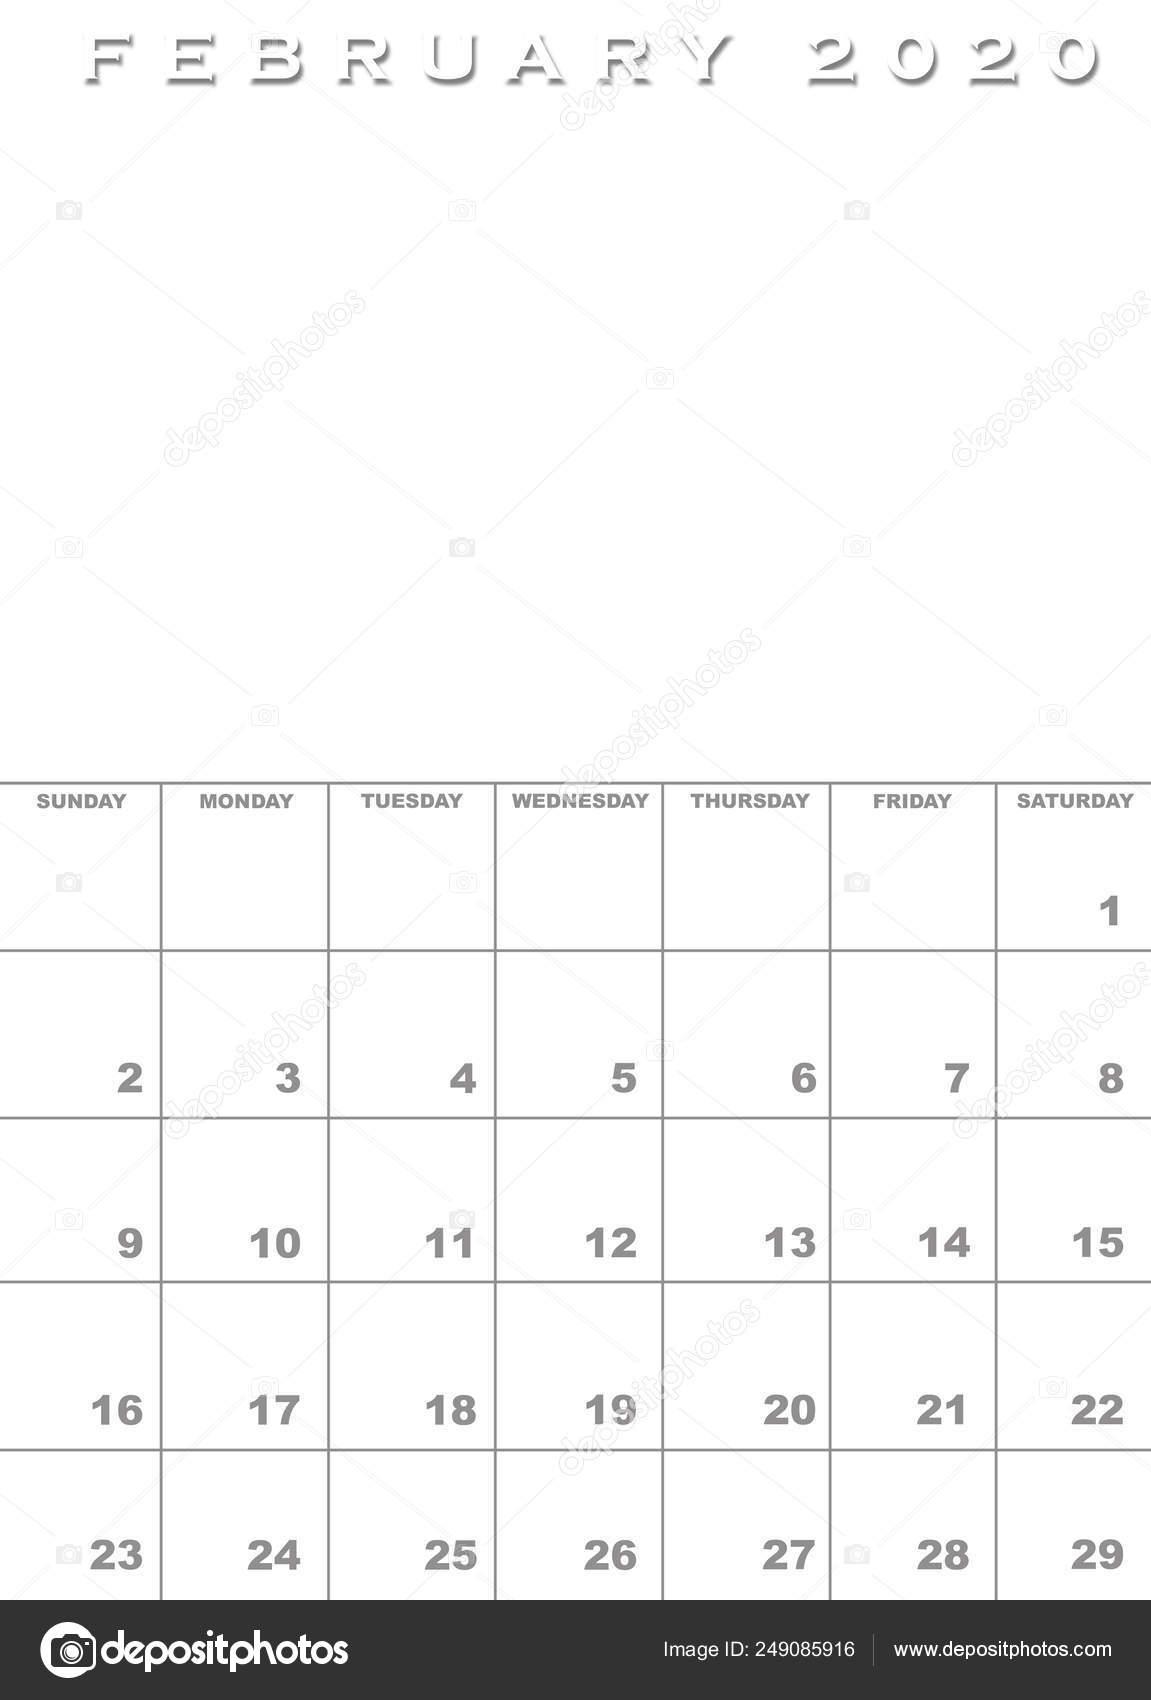 Febbraio Calendario 2020.Modello Di Calendario Febbraio 2020 Foto Stock